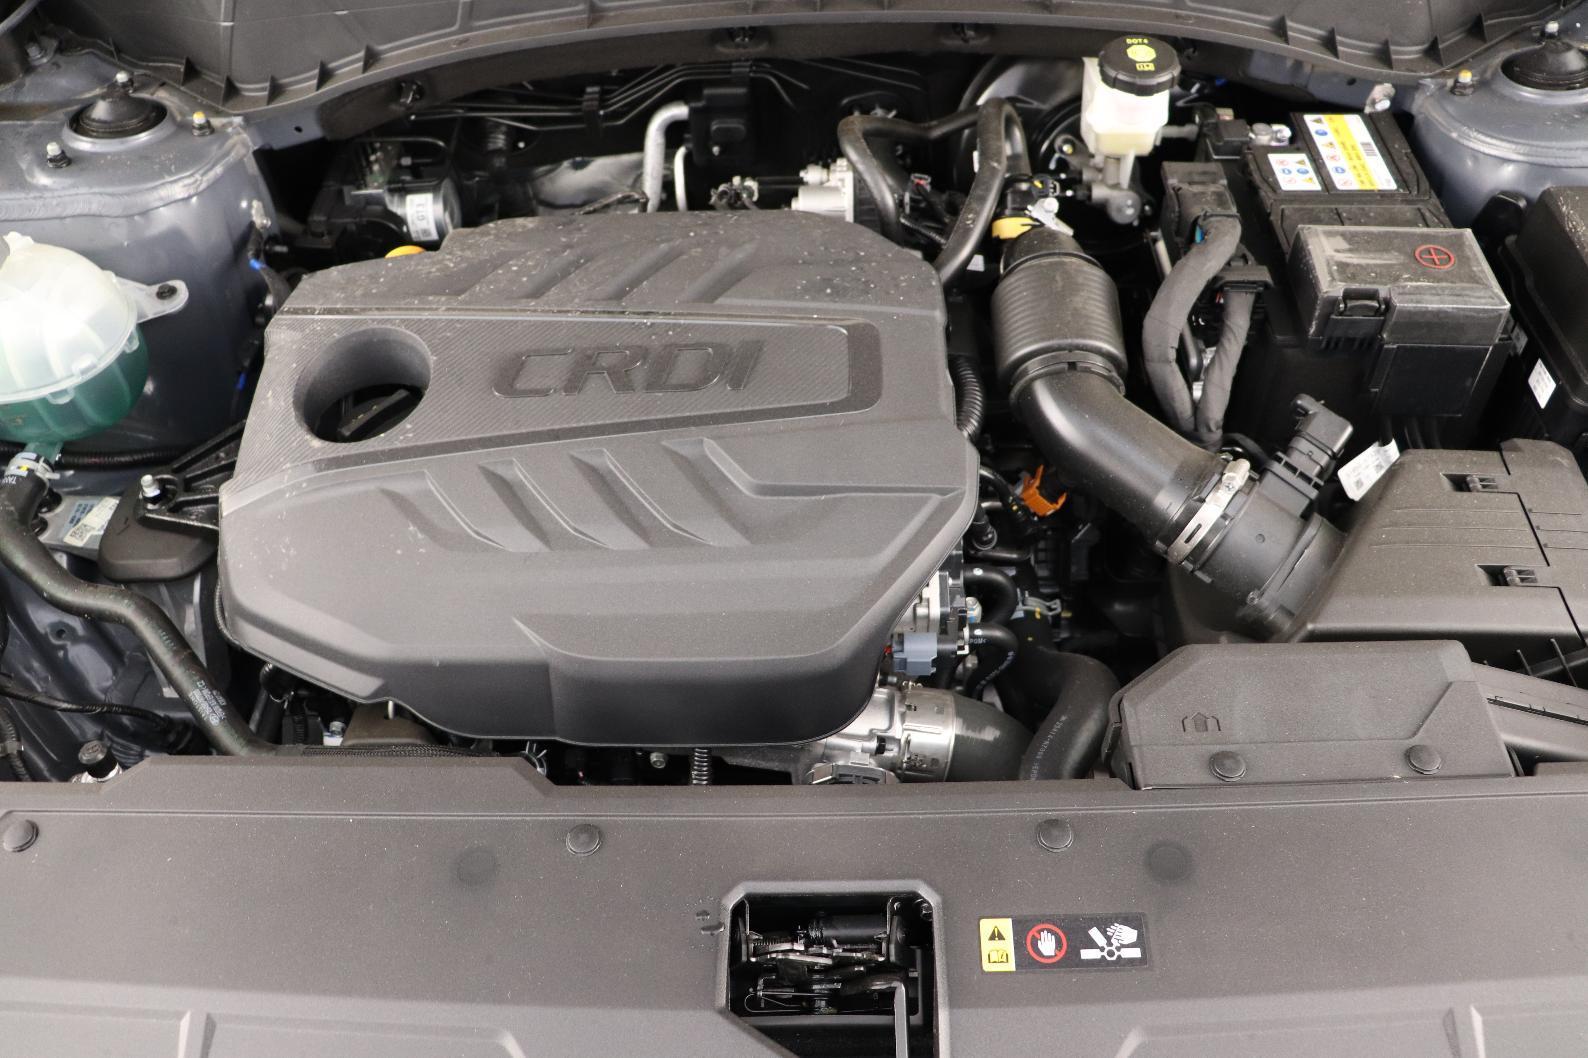 HYUNDAI TUCSON 1.6 CRDi 136 hybrid 48V DCT-7 Business